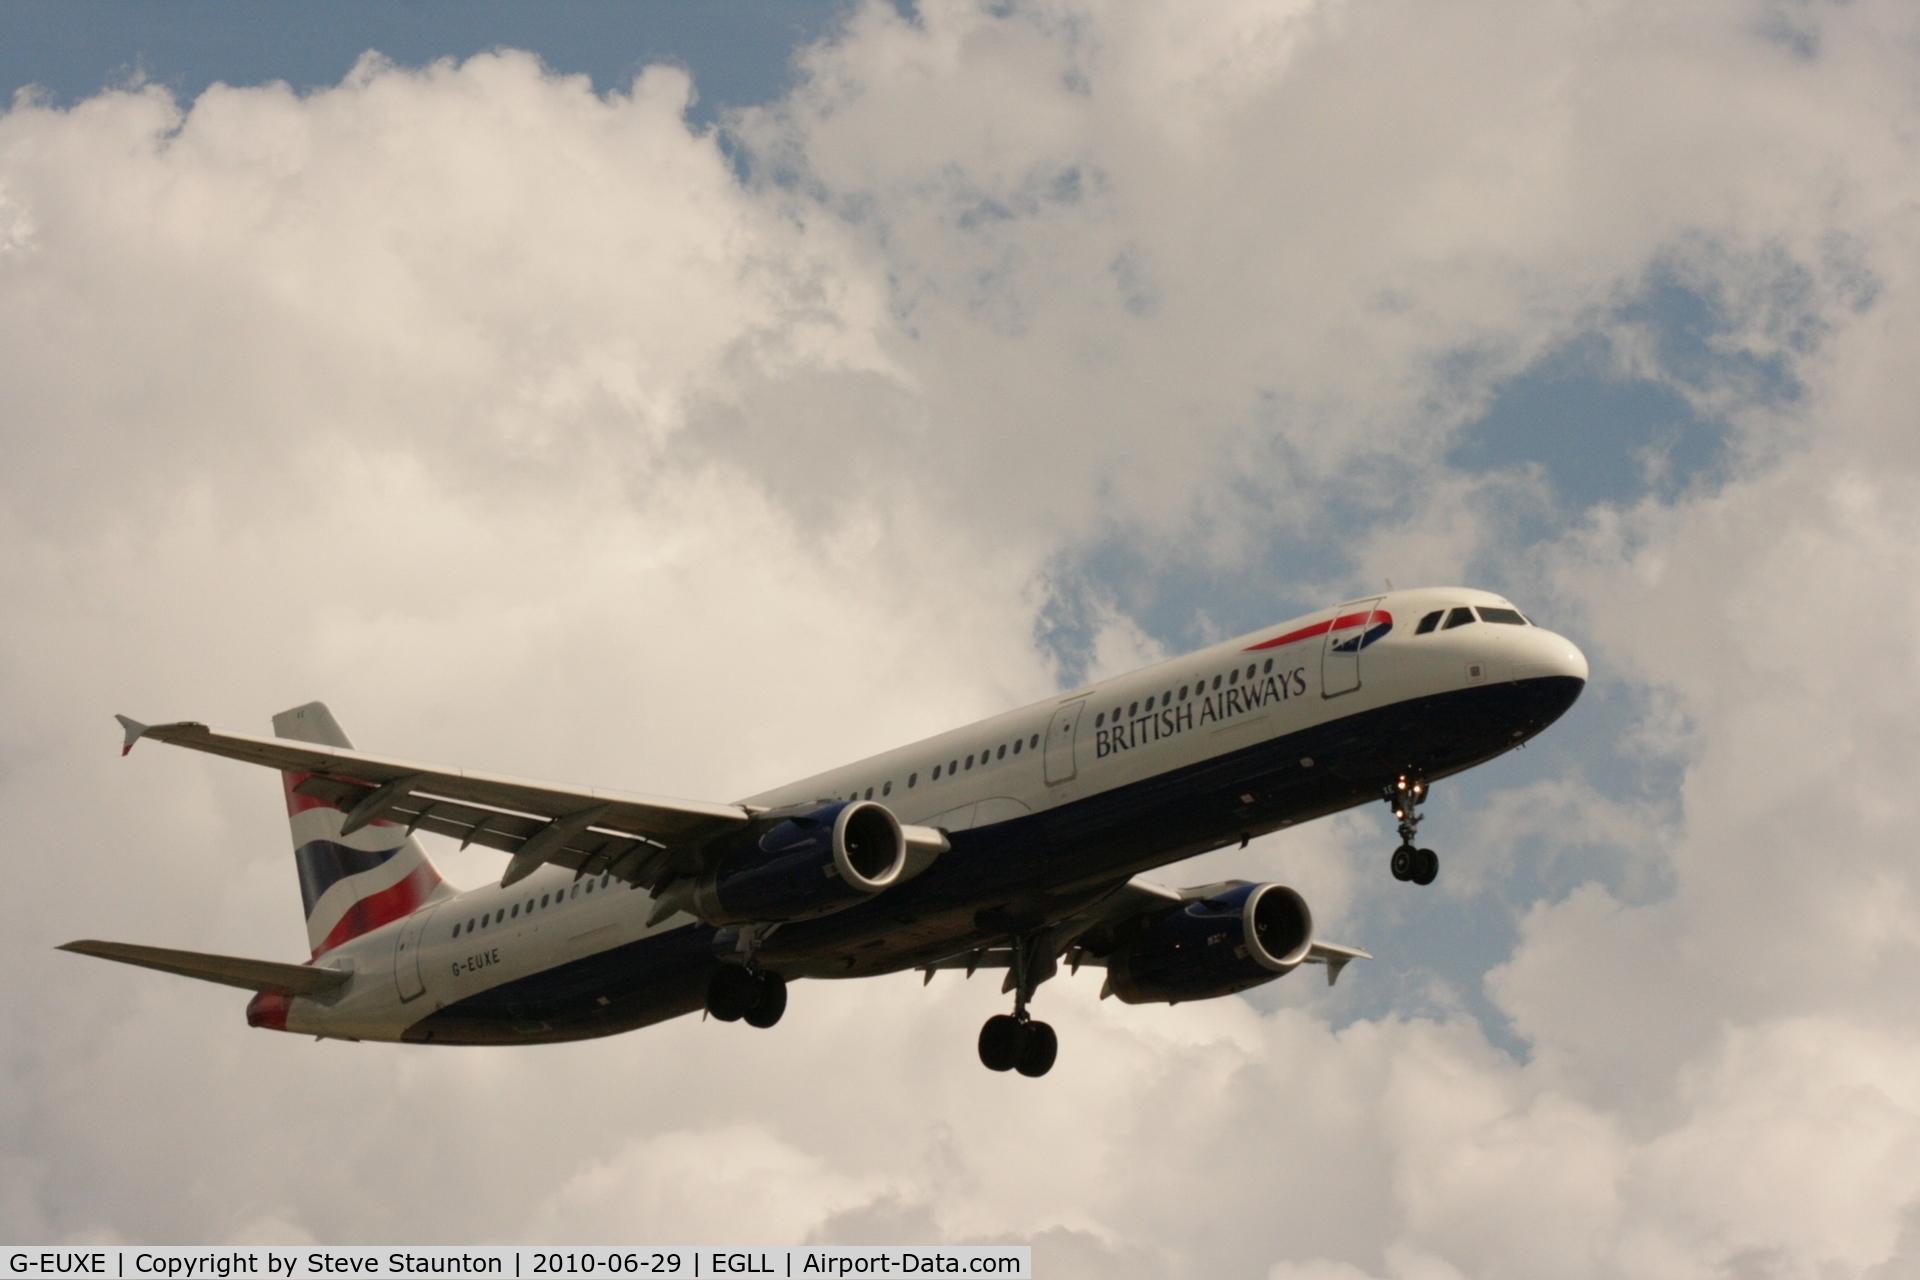 G-EUXE, 2004 Airbus A321-231 C/N 2323, Taken at Heathrow Airport, June 2010